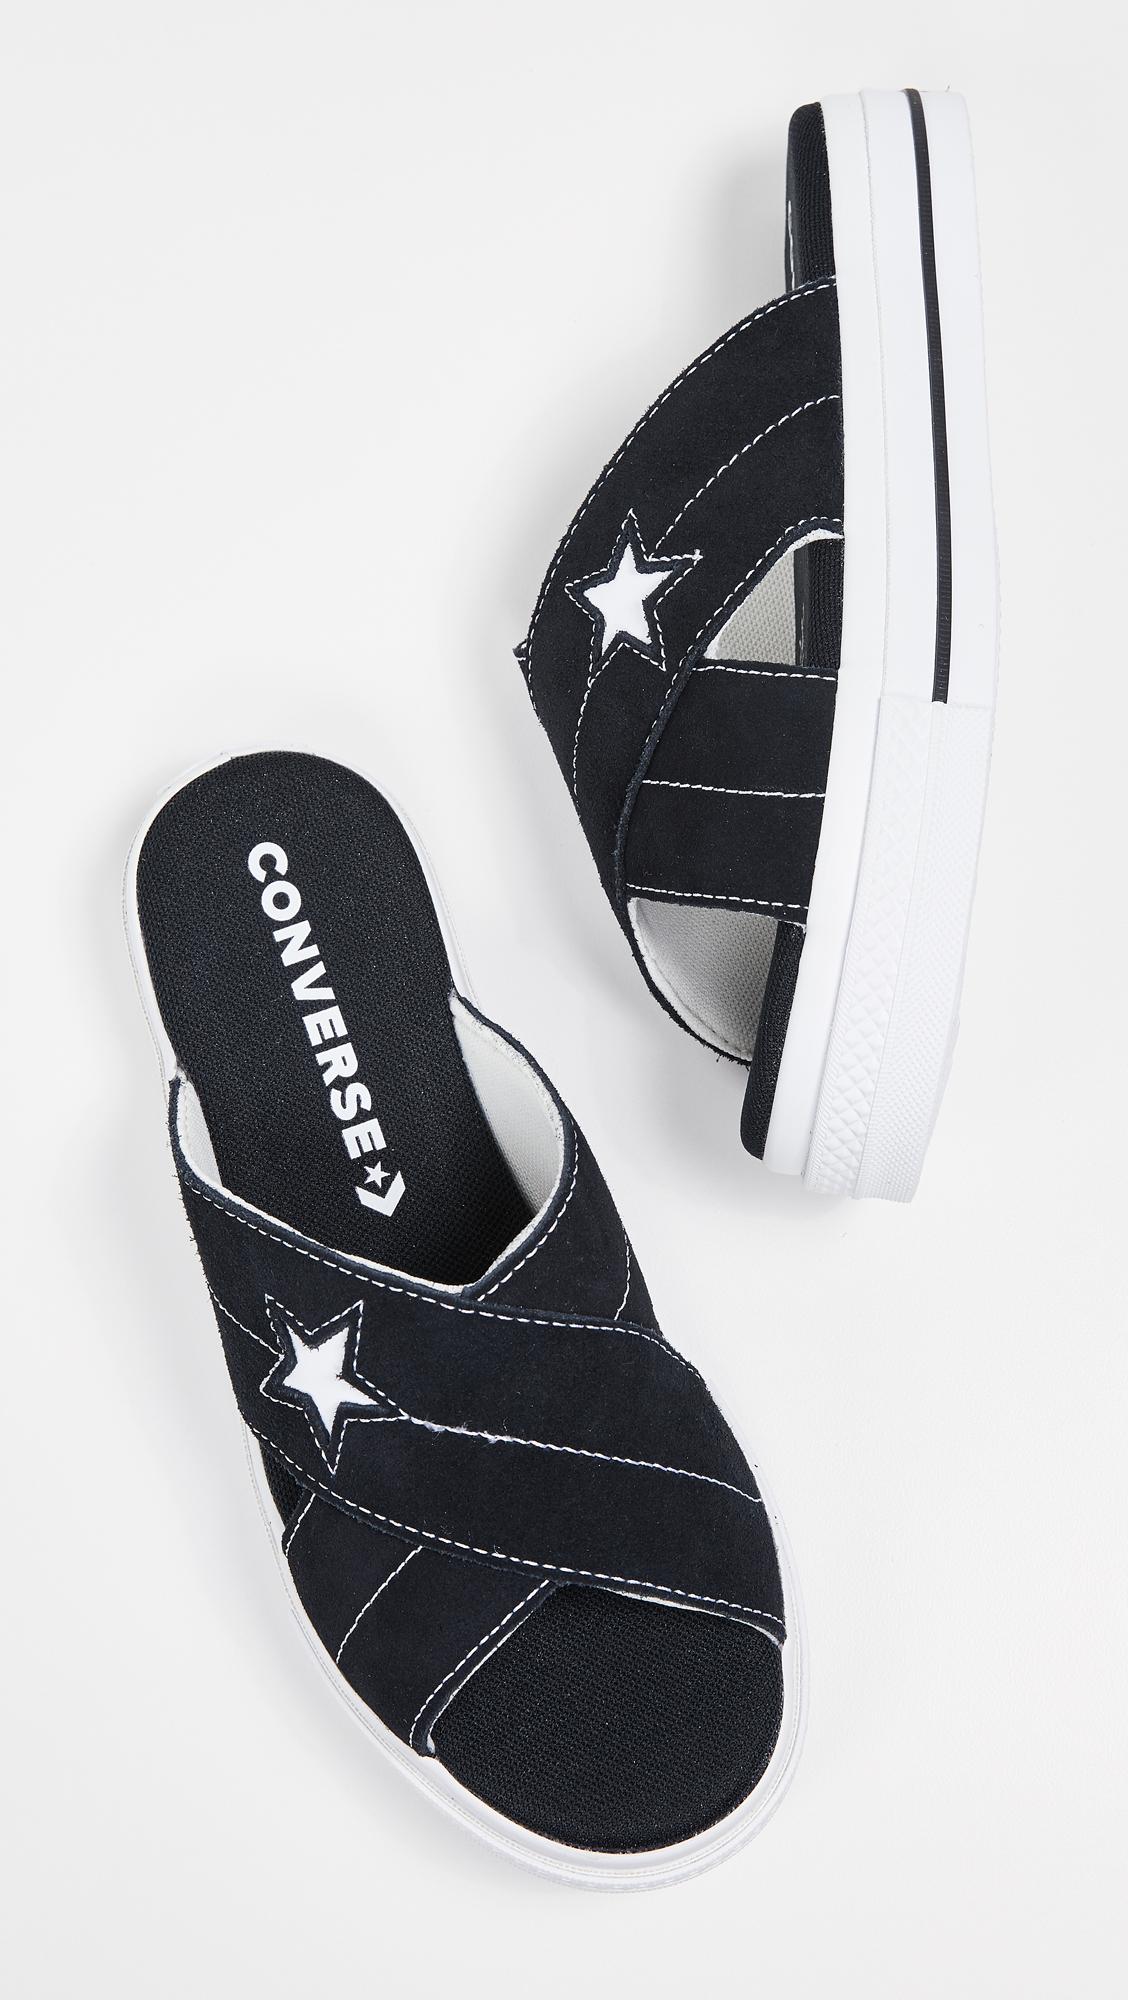 SandalsShopbop Star Converse One Converse One Star b7gf6yYv